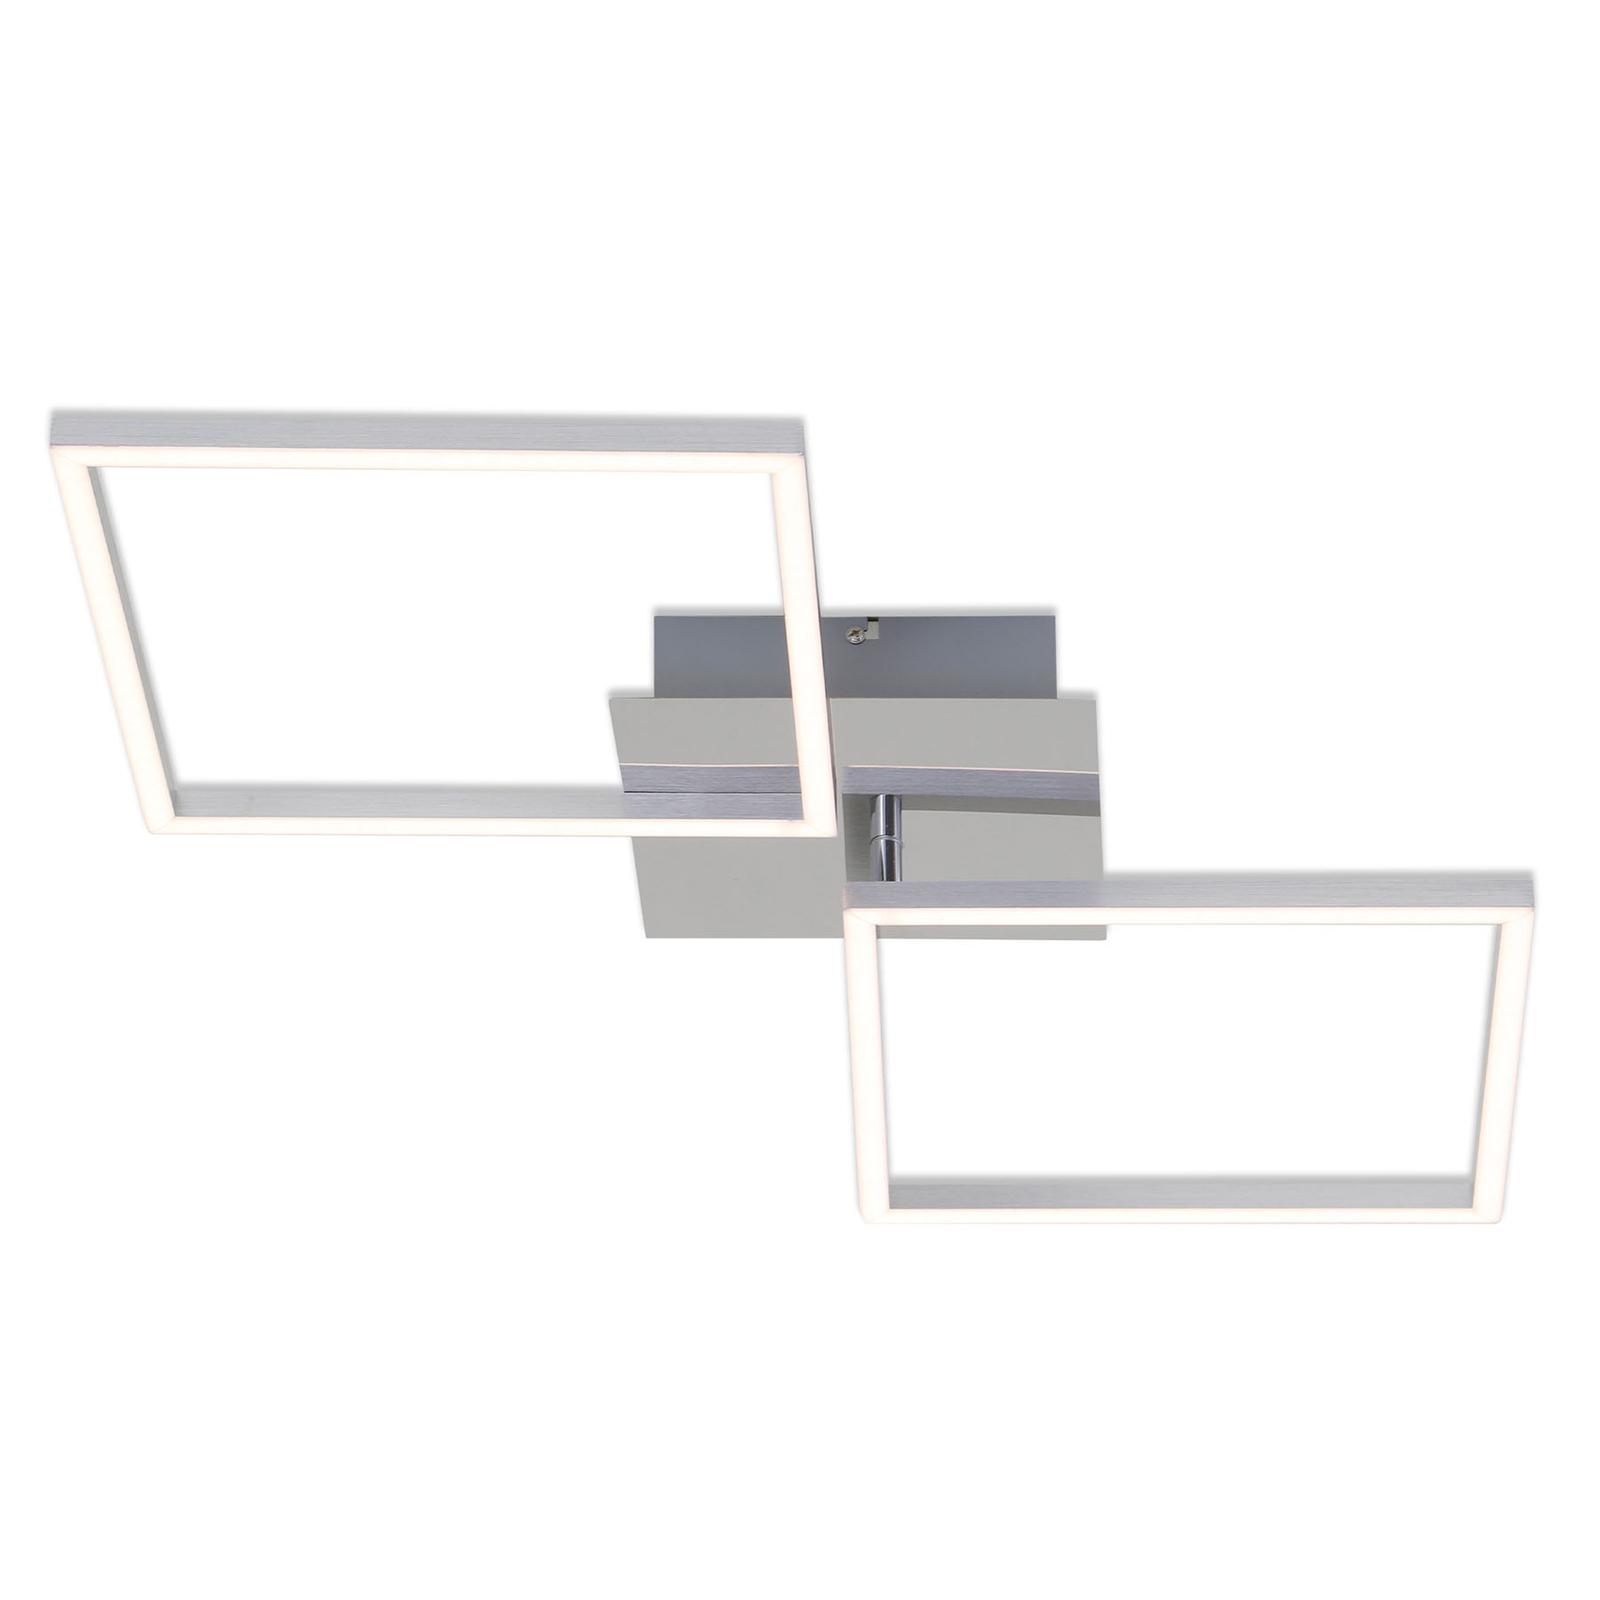 Lampa sufitowa LED Frame, aluminium, 76x36cm